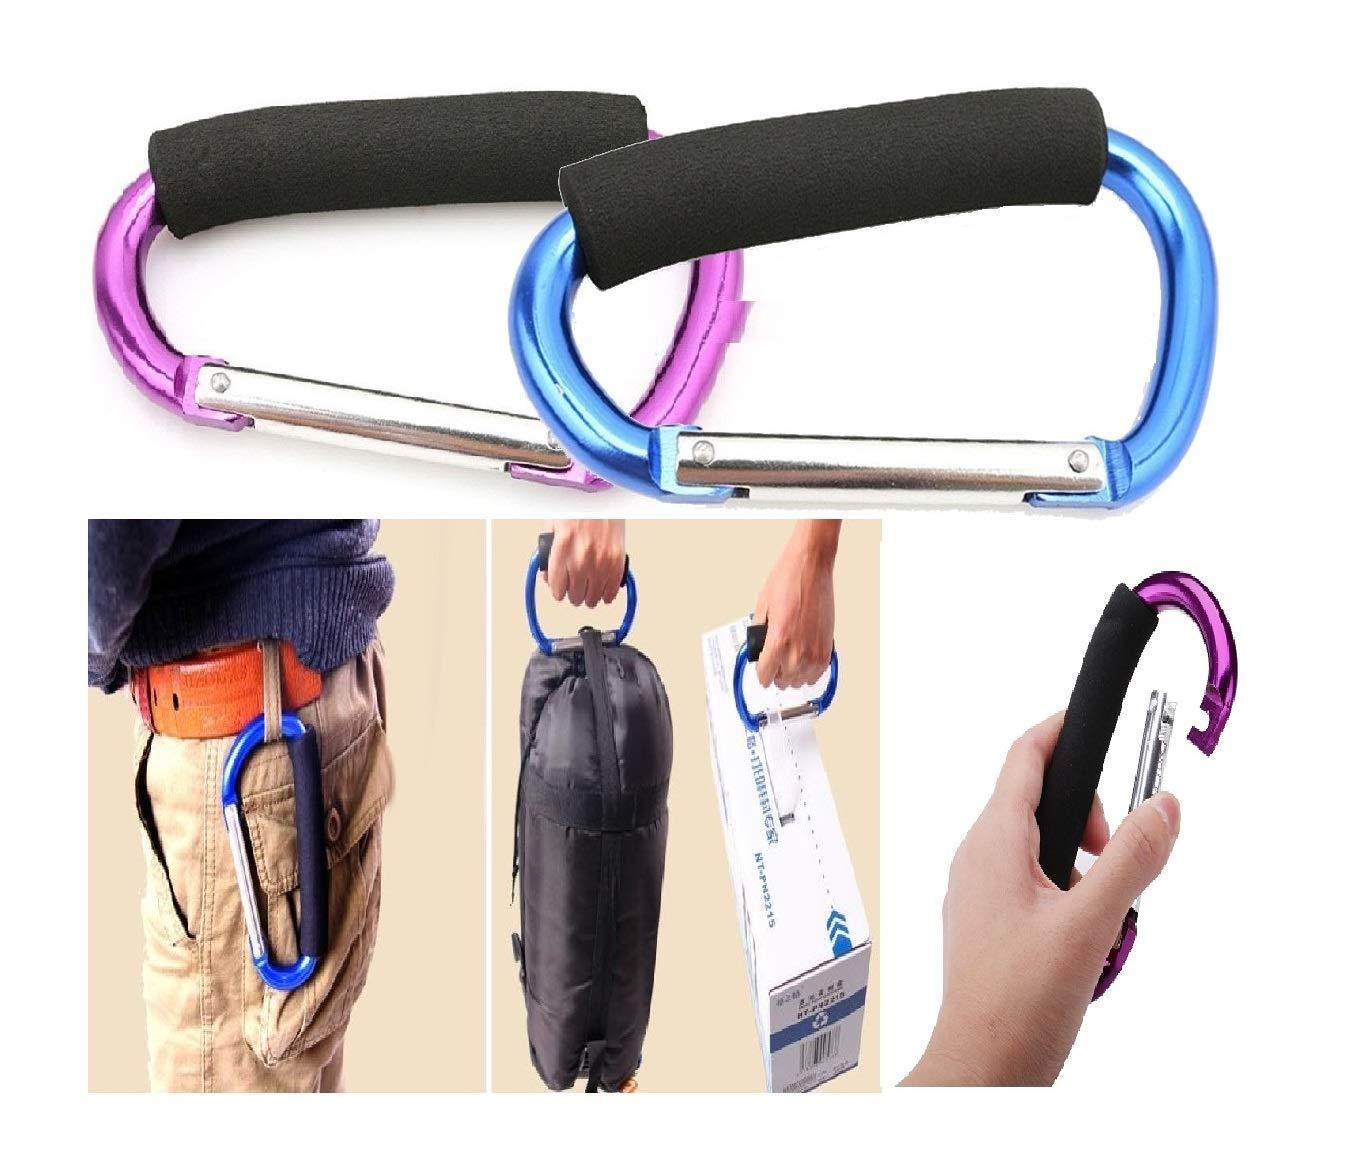 Stroller Hook - 4 Pack of 360 Degree Swivel Stroller Carabiner Hooks - Hanger Clips for Baby Diaper Bags, Shopping Bags, Purse - Great Hook Set for Mommy When Walking or Shopping Newraturner